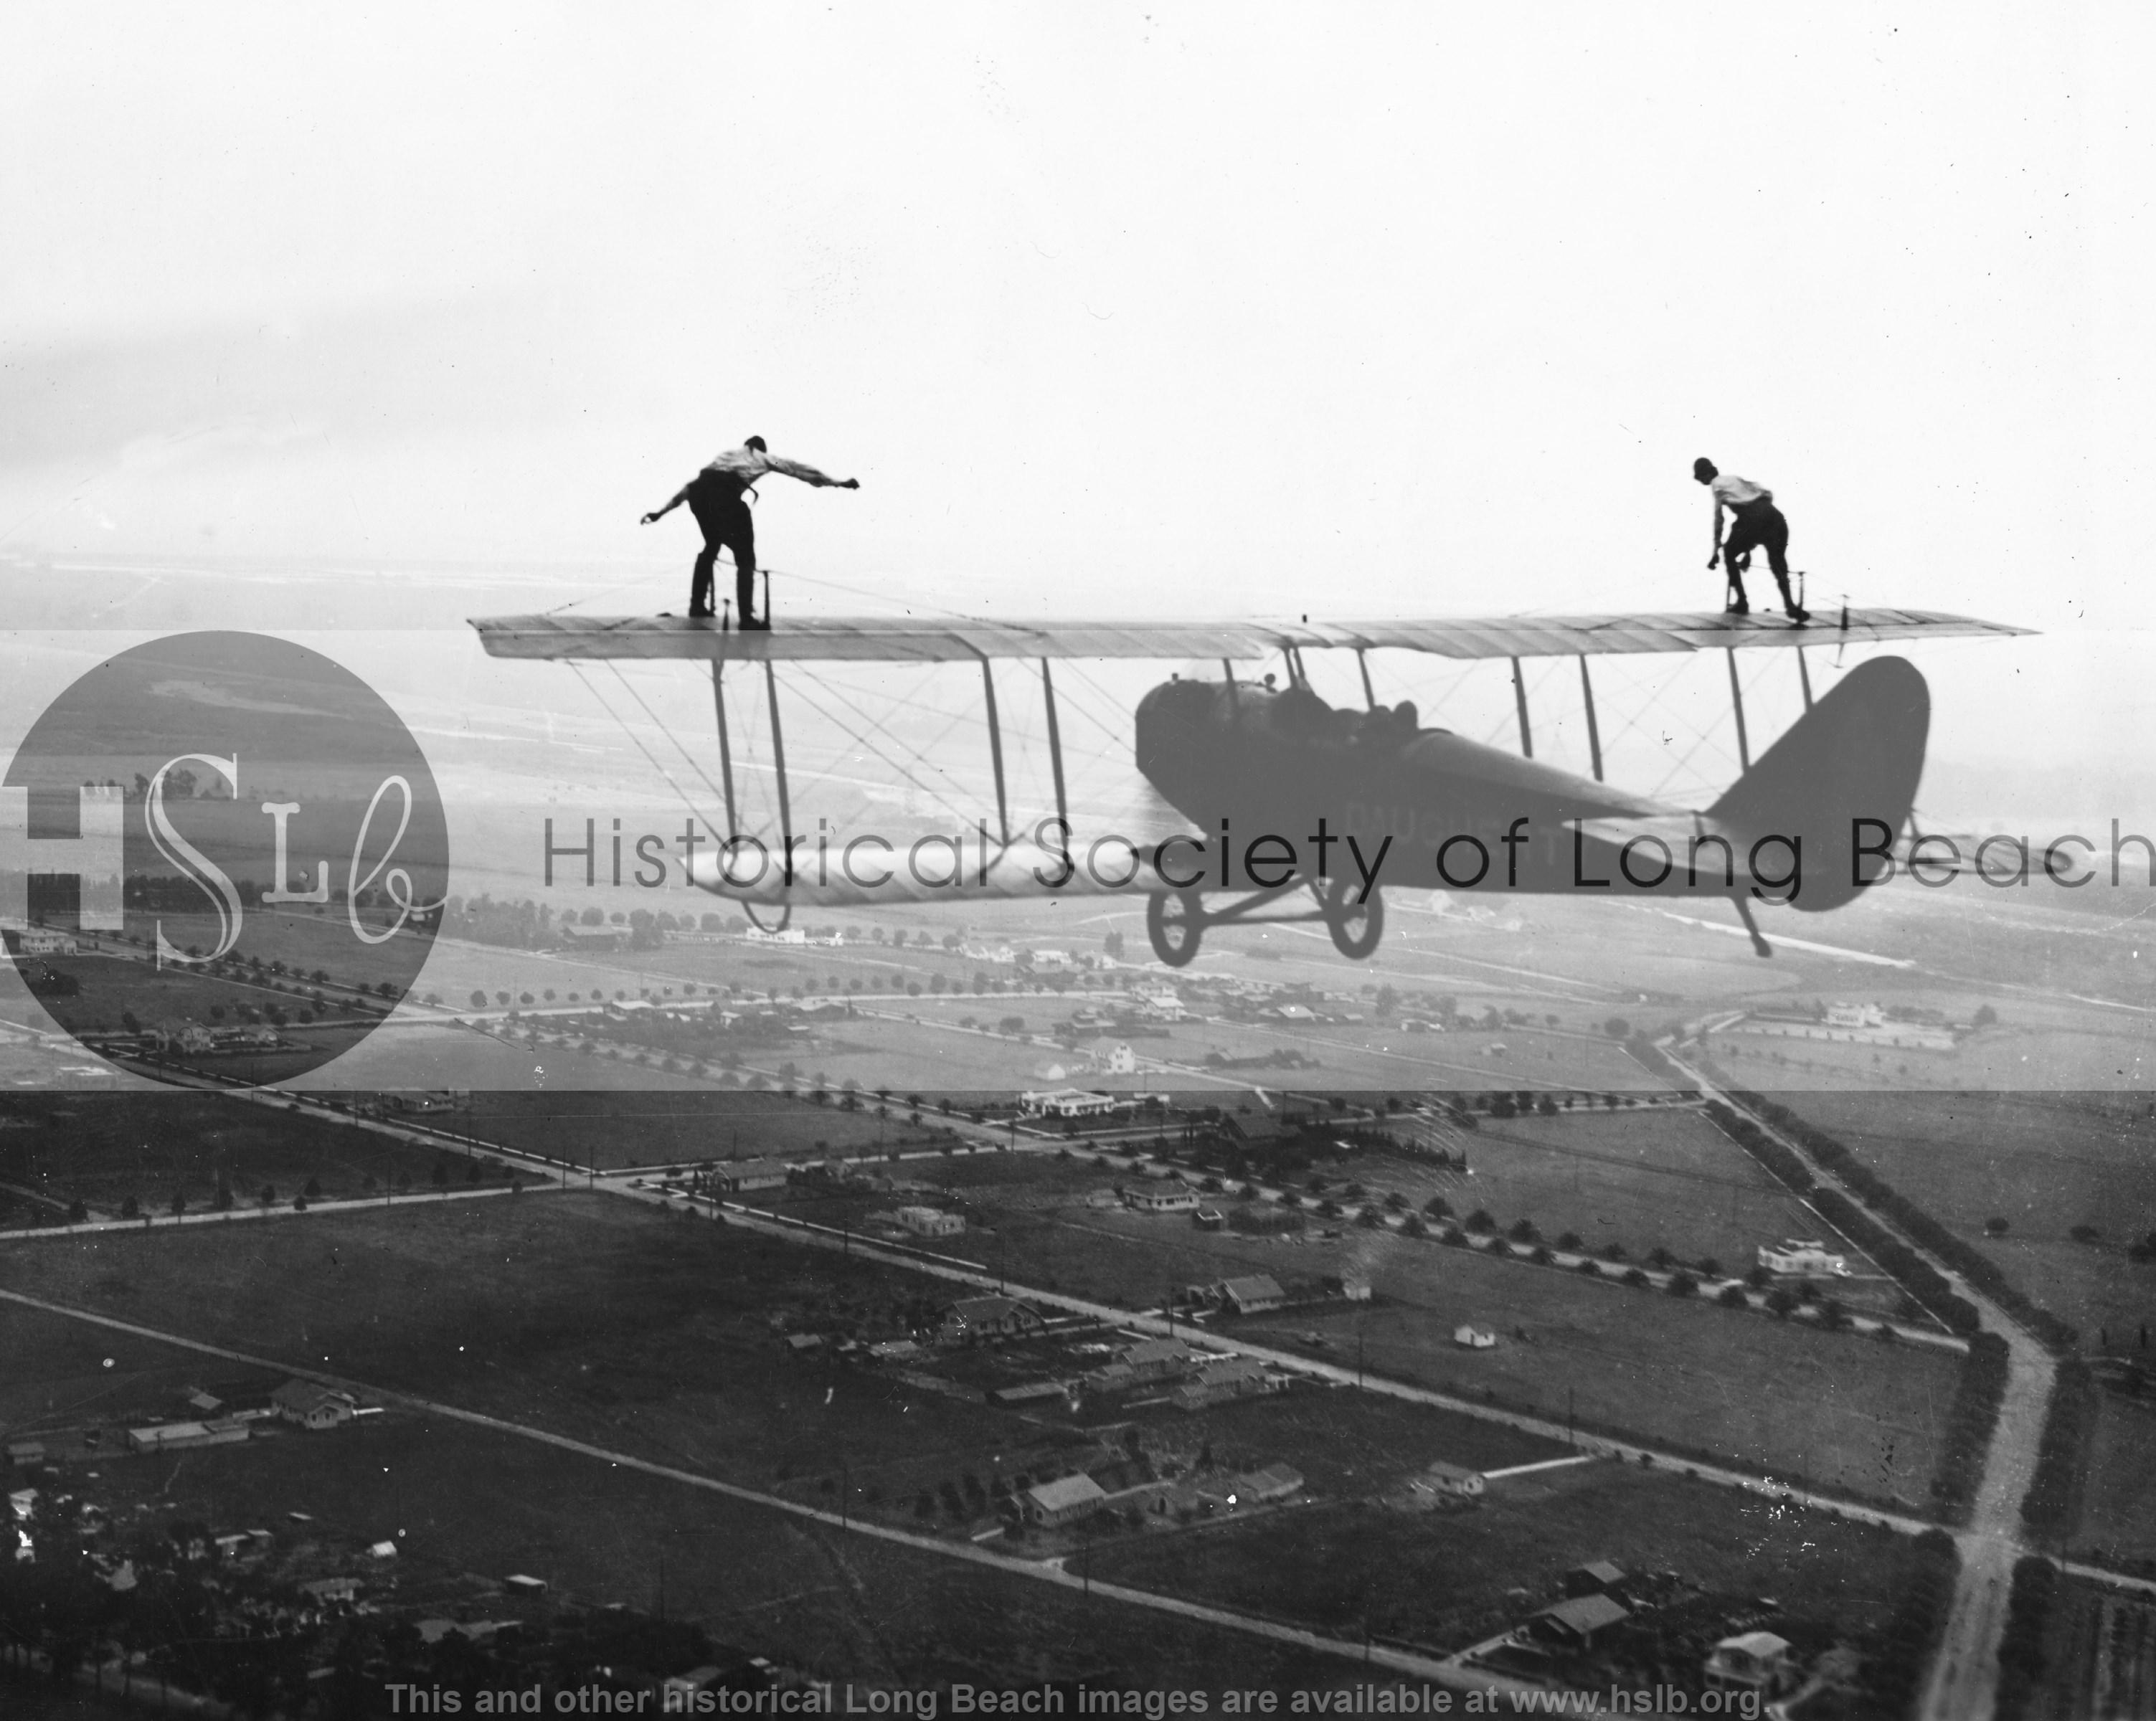 Daugherty wingwalkers, 1920s vintage photograph